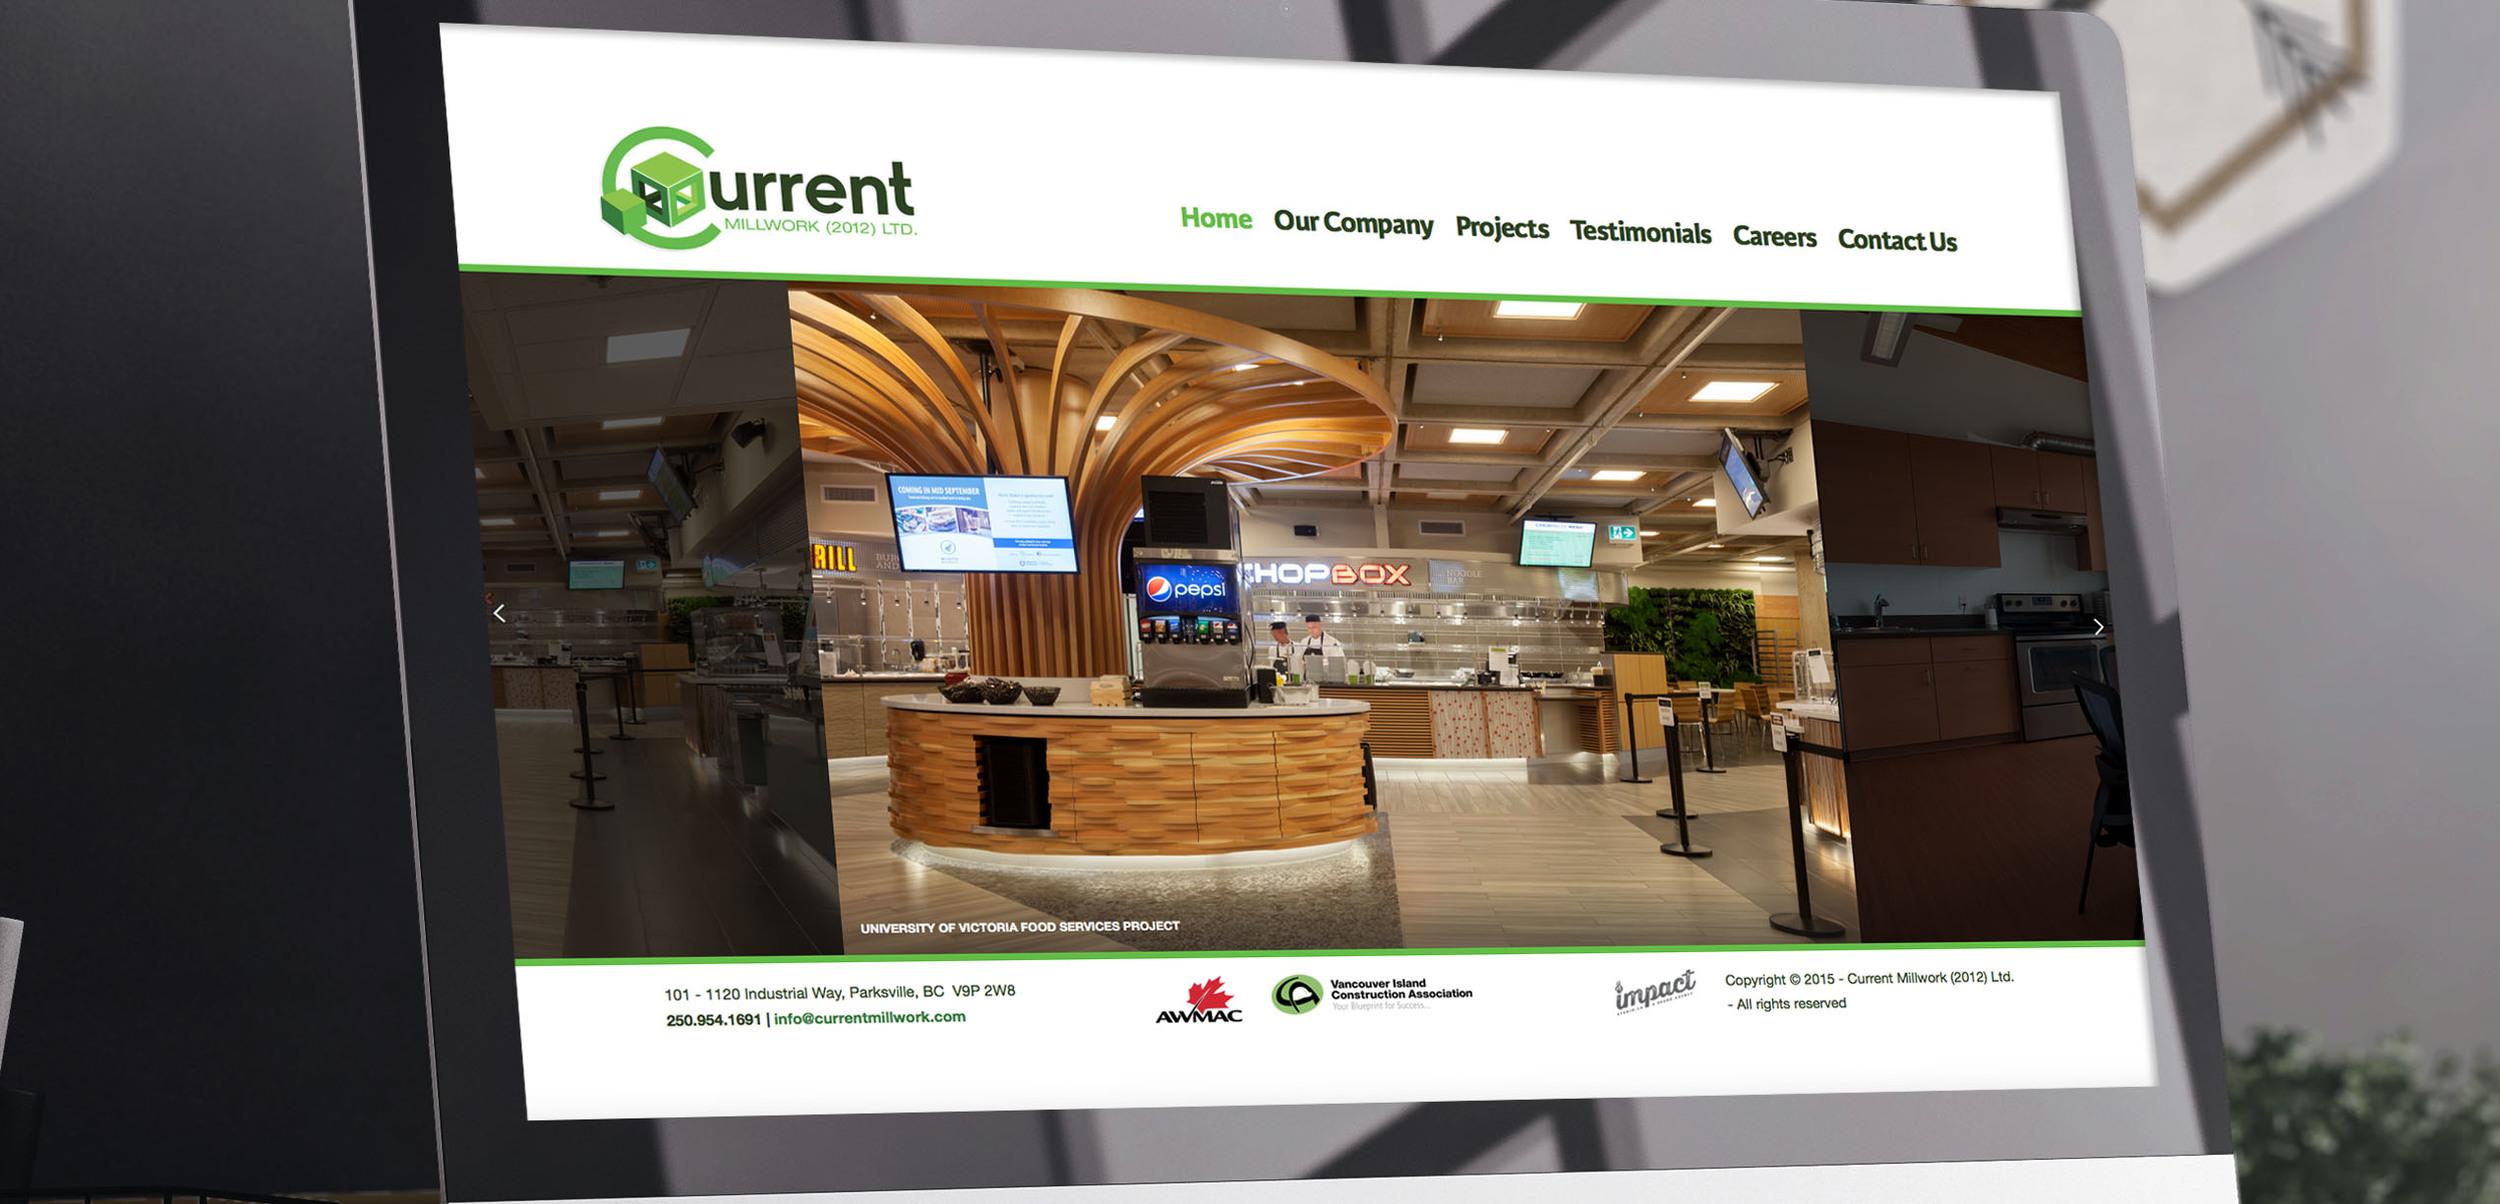 currentmillwork.com